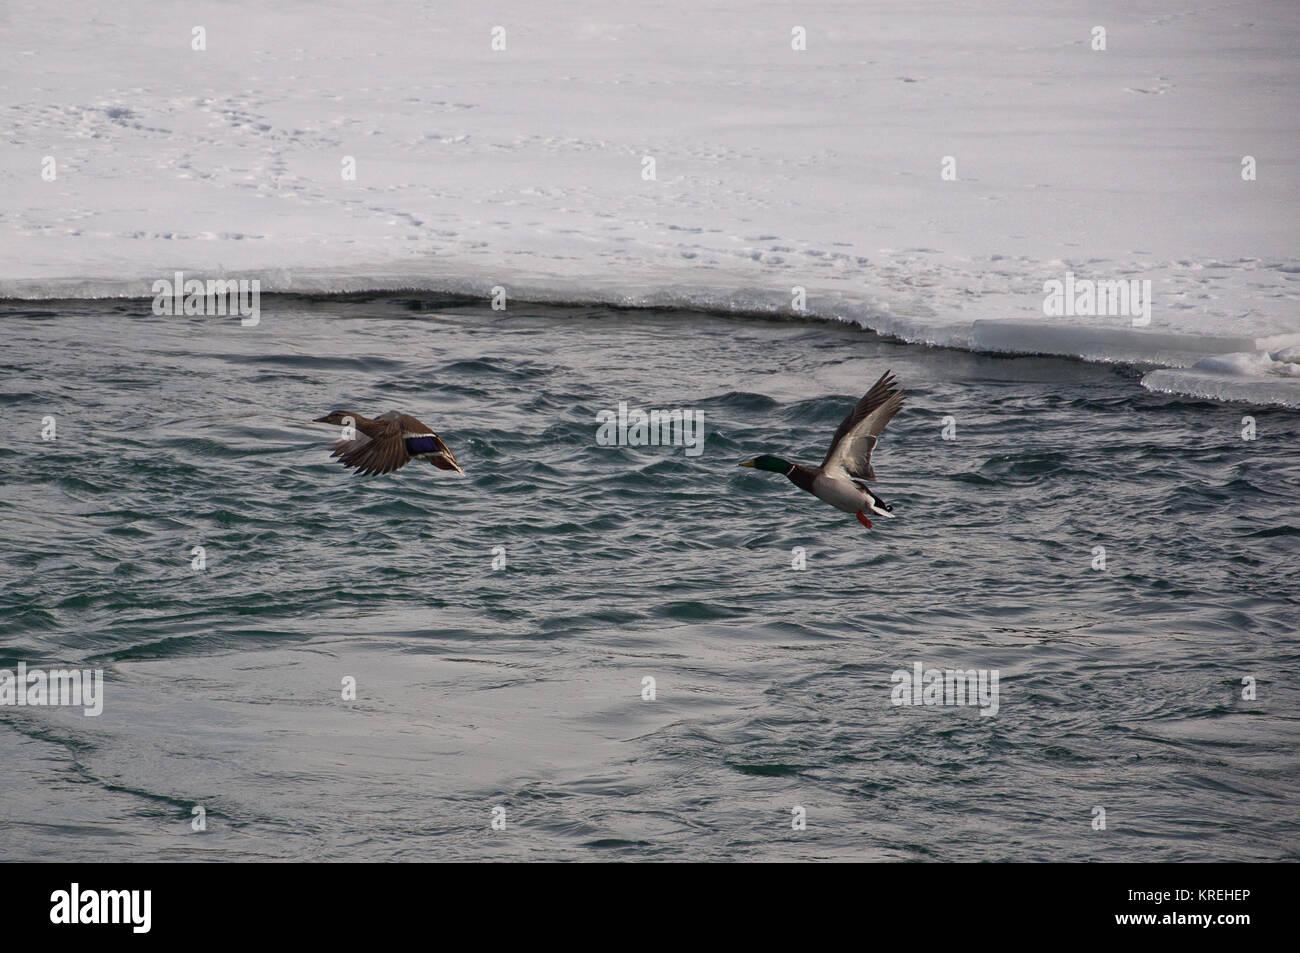 Mallard Ducks in Flight over Icy Water, Bow River, Inglewood Bird Sanctuary, Calgary, Alberta, Canada. Stock Photo